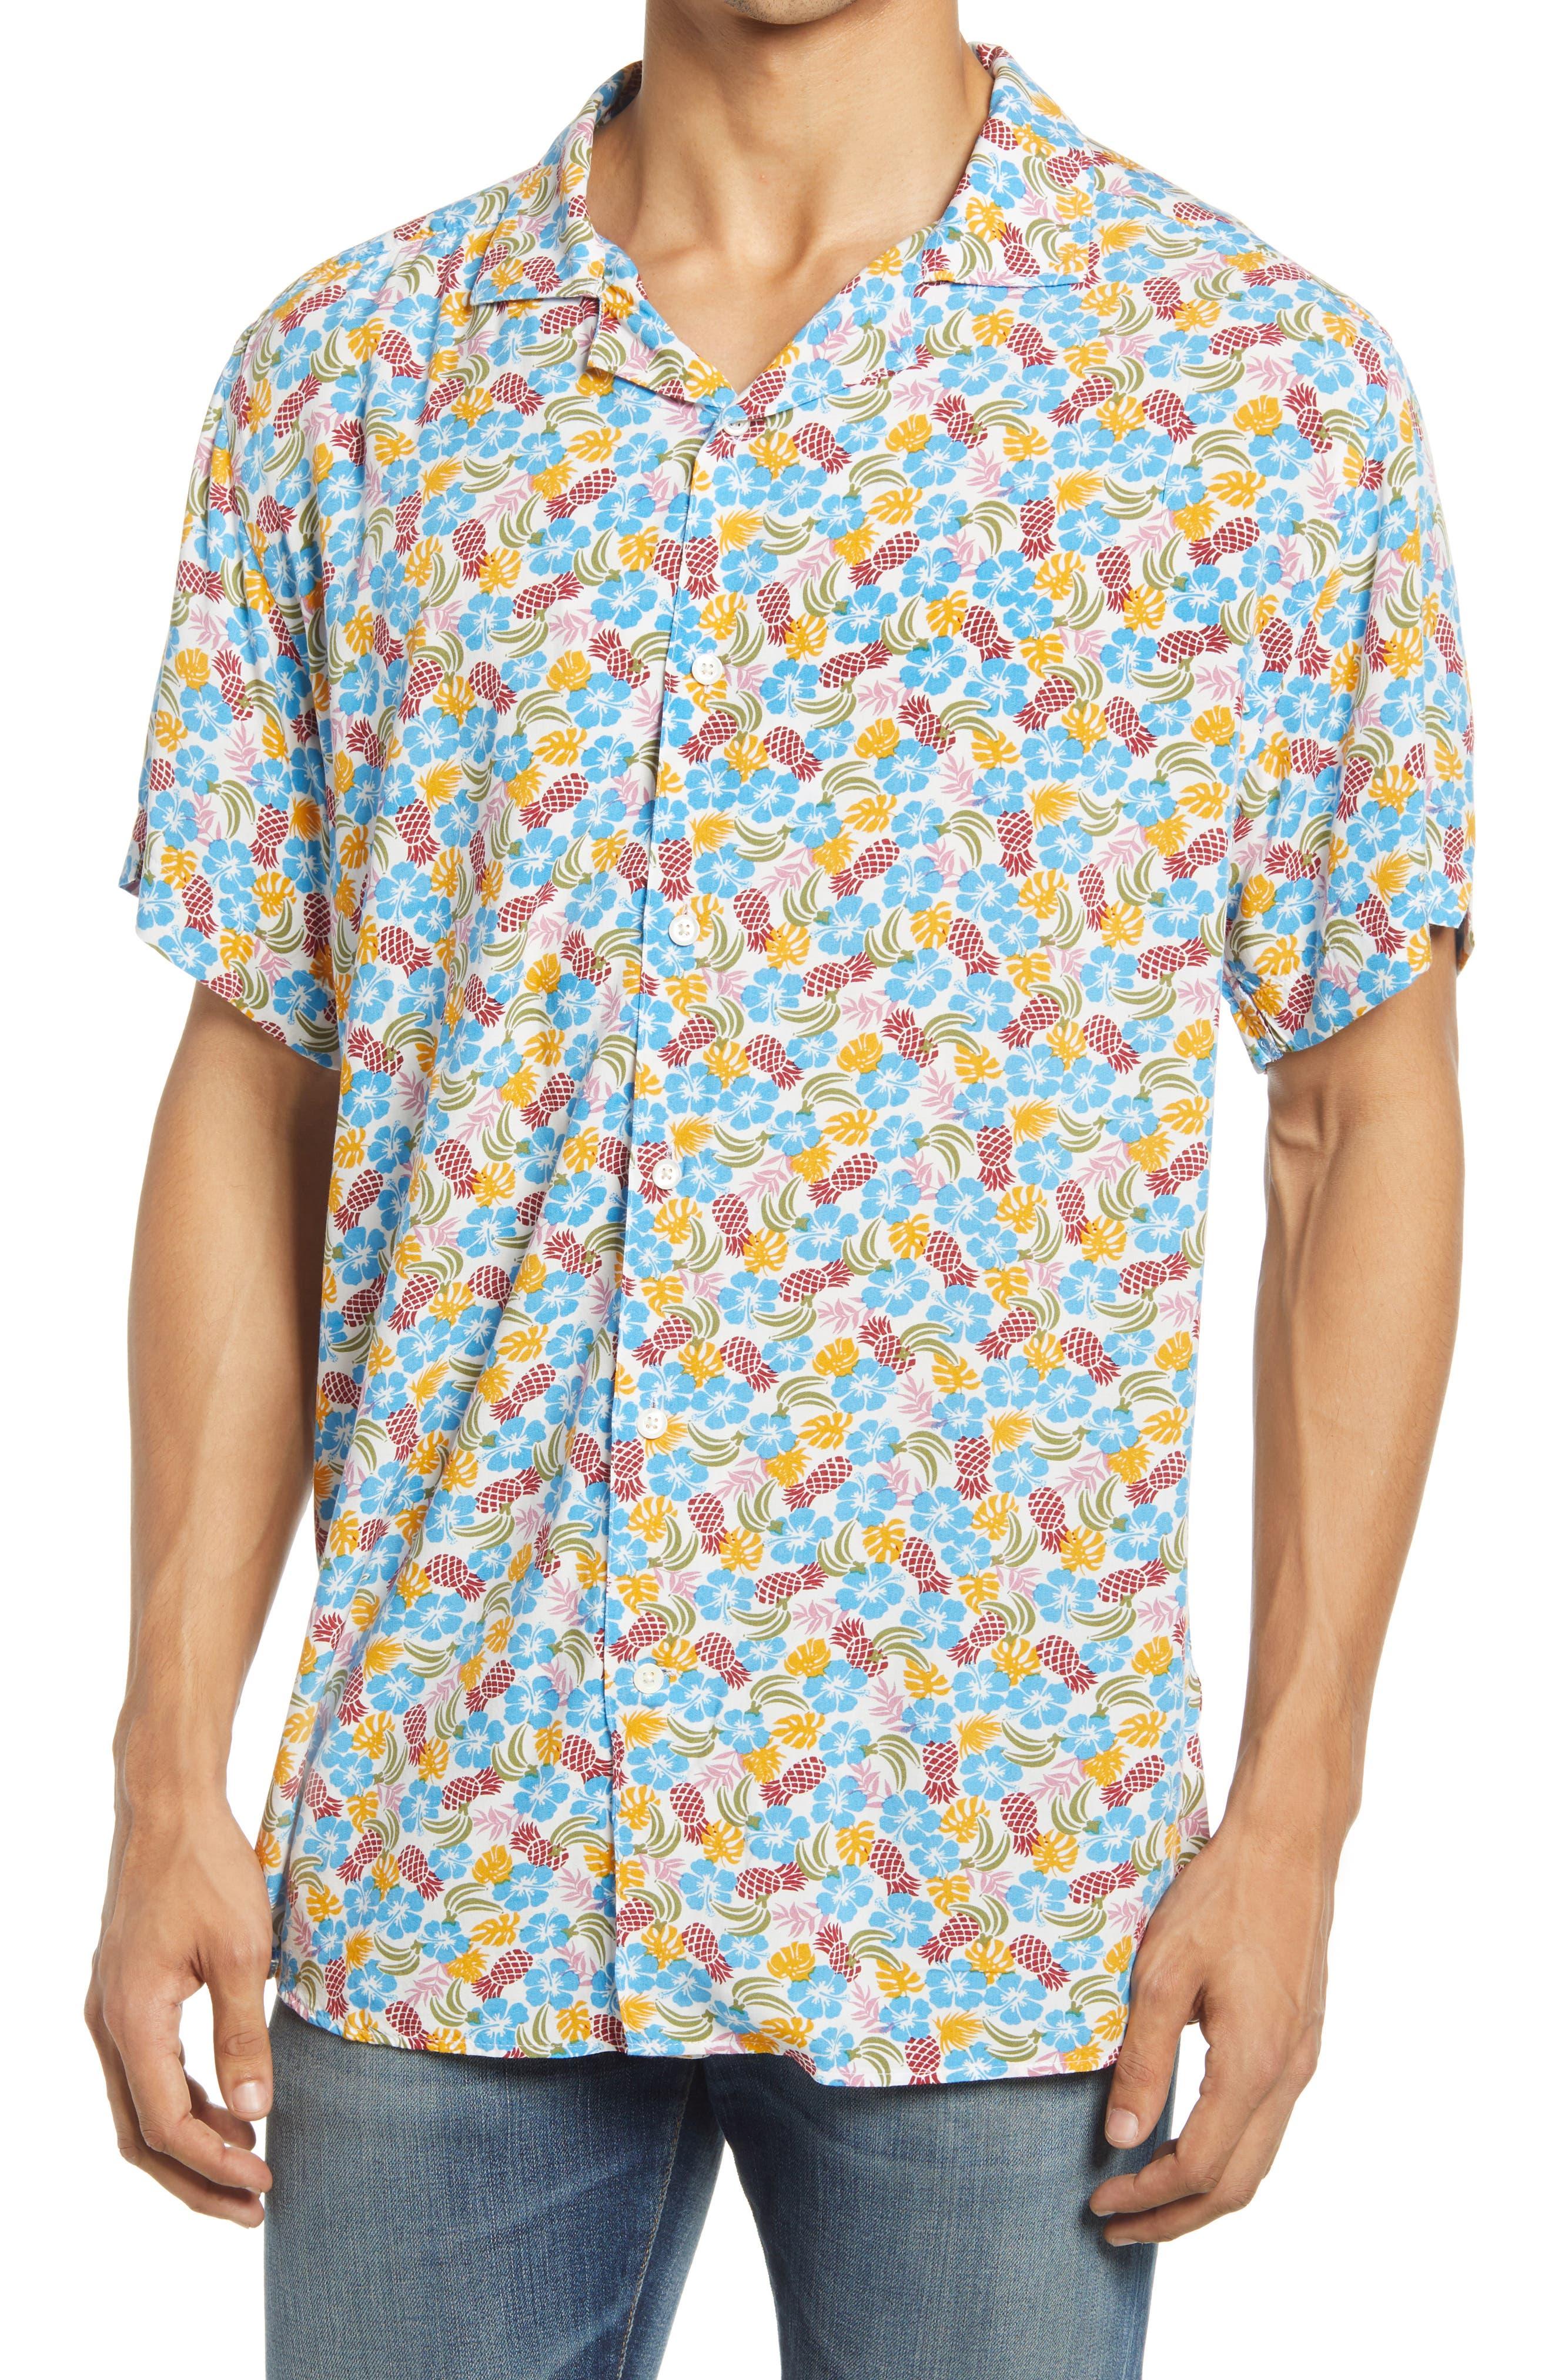 Floral & Pineaple Short Sleeve Button-Up Camp Shirt